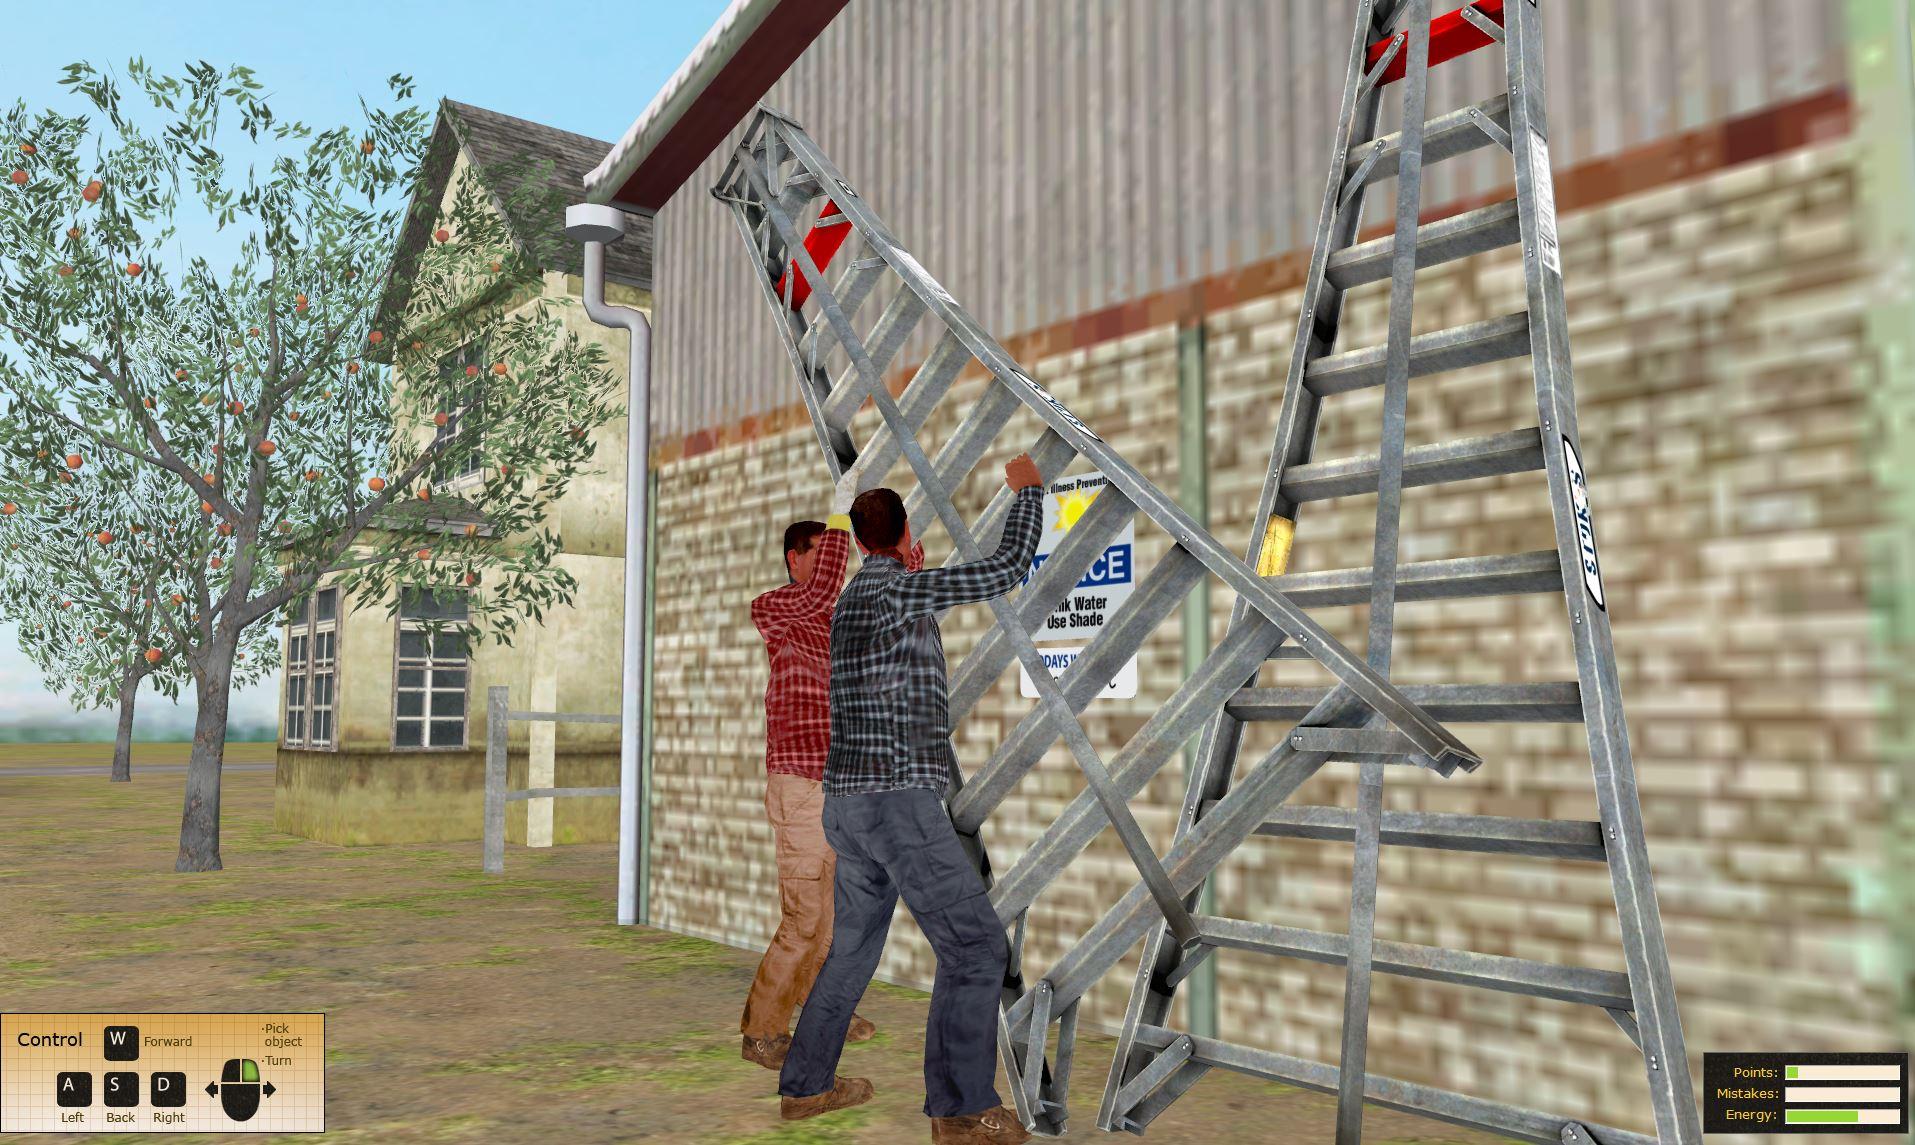 State Compensation Insurance Fund Safety Training Simulator Ladder Safety